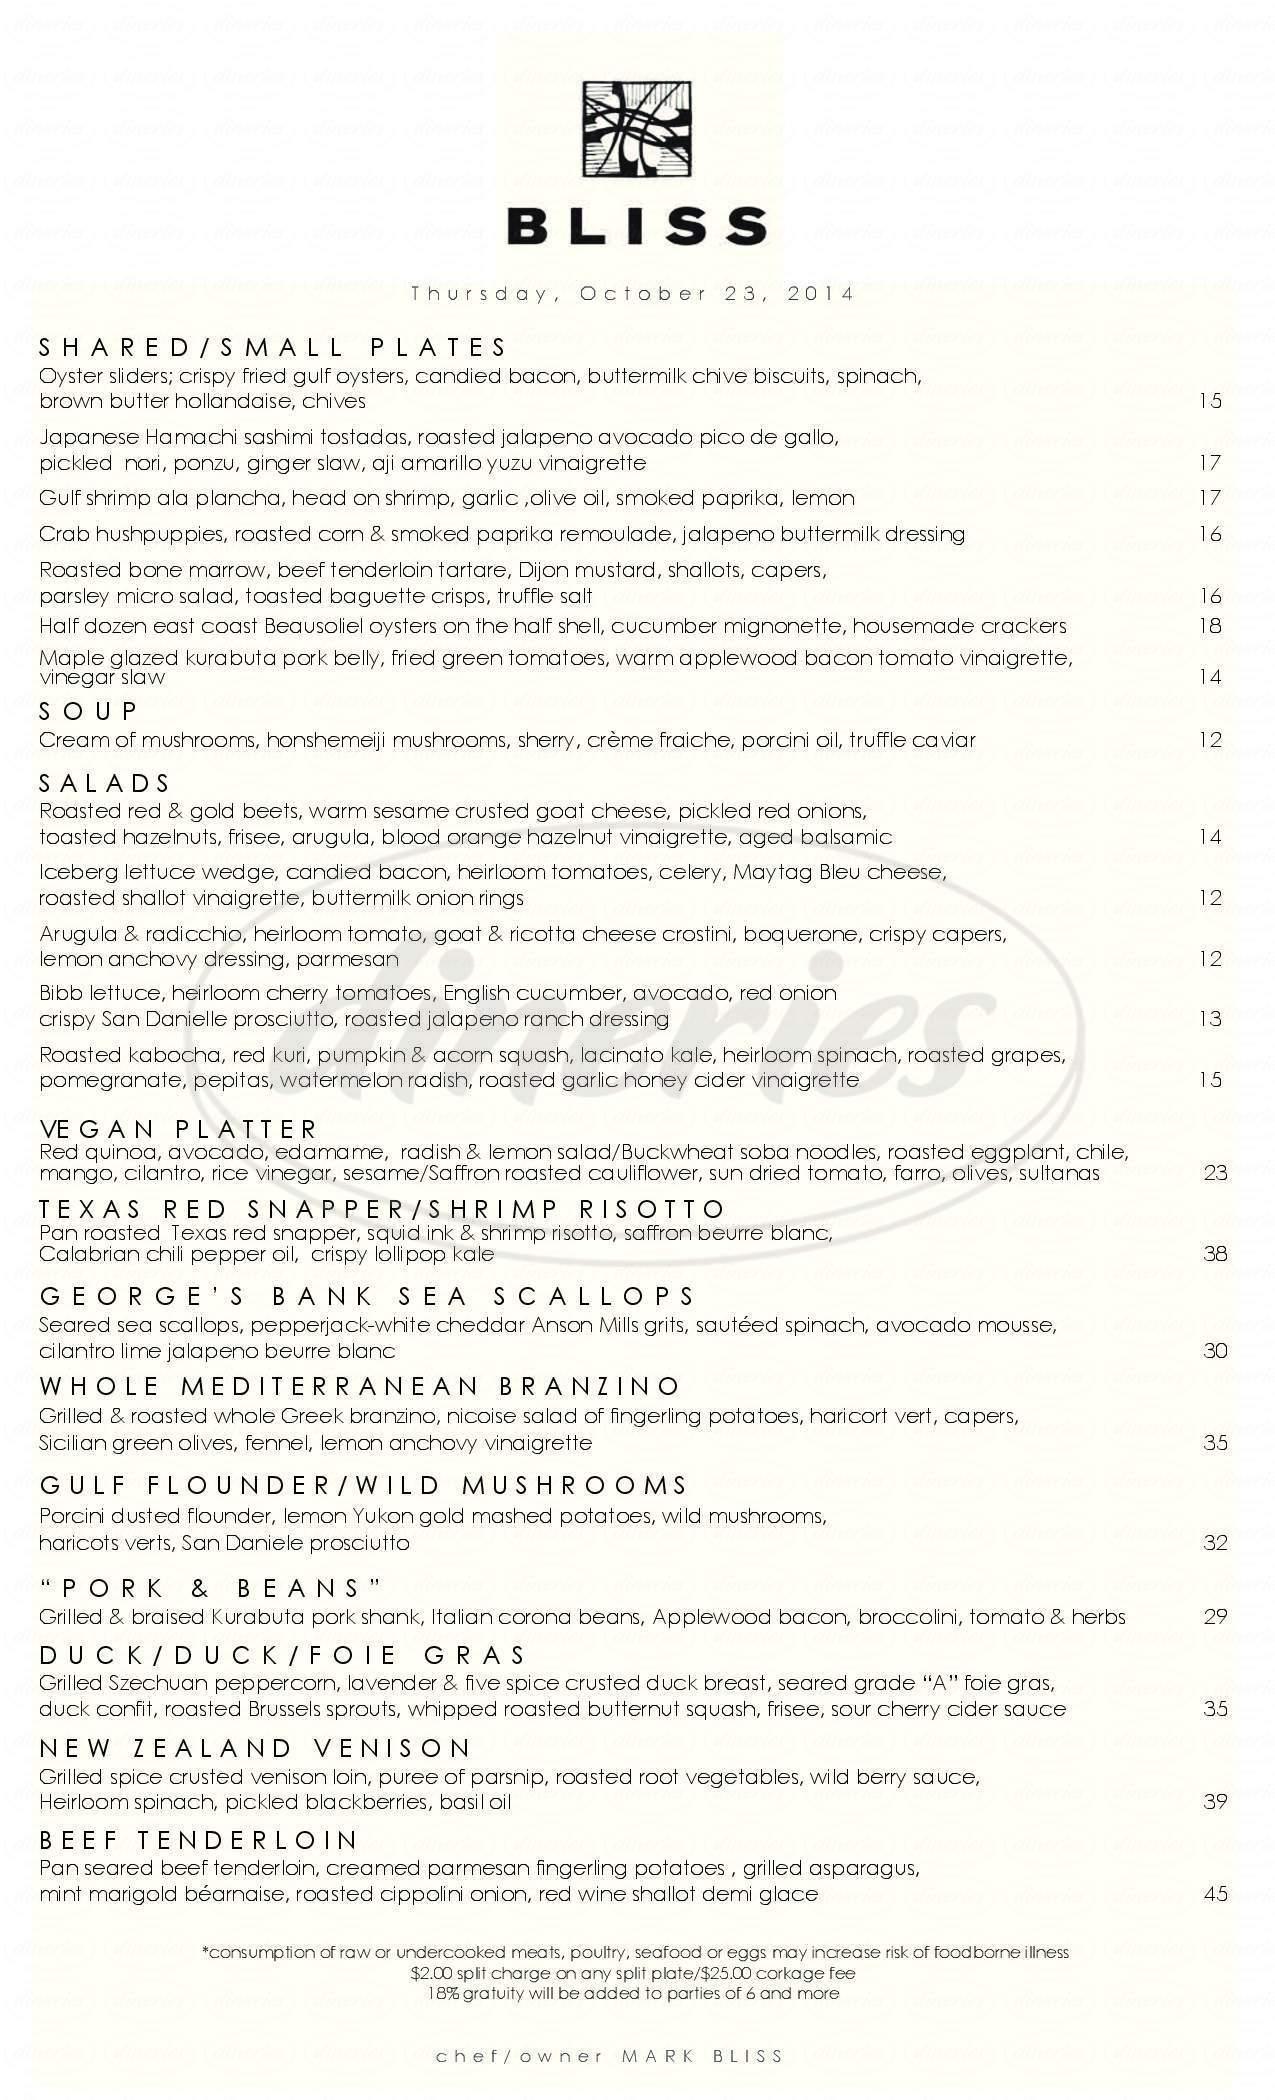 menu for Bliss